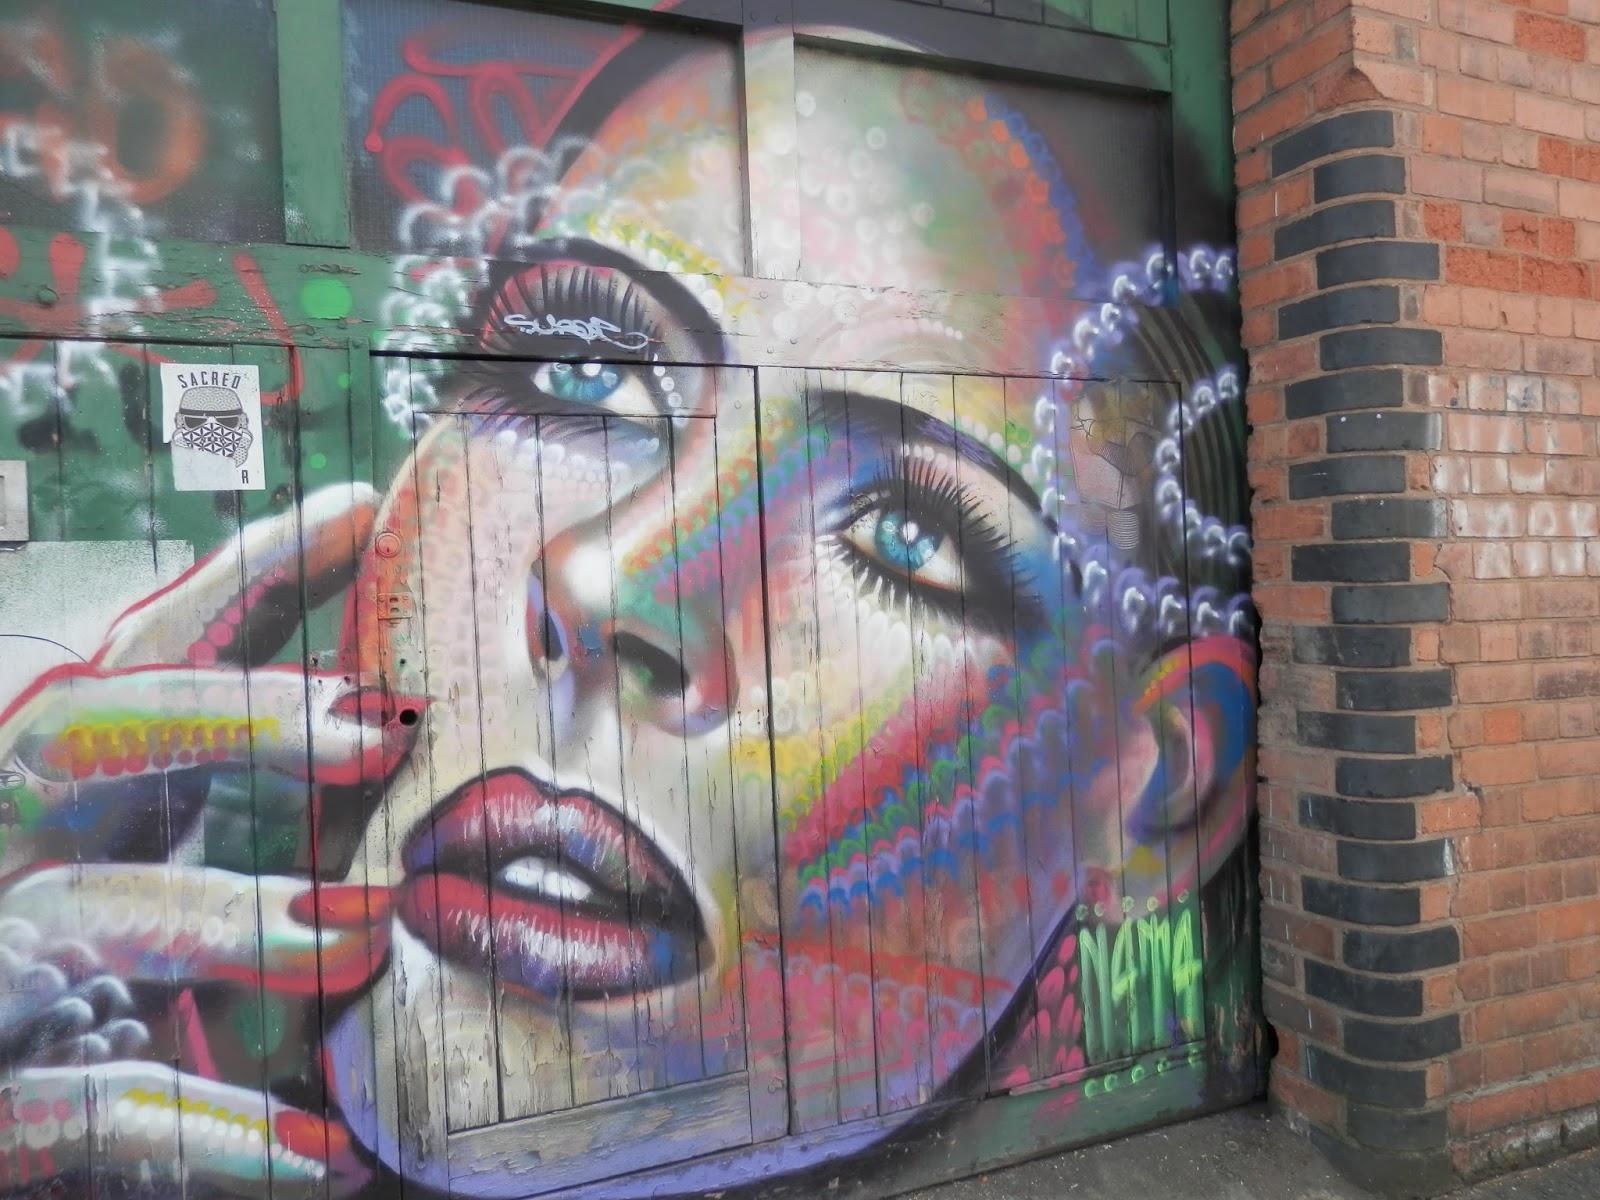 Street art and graffiti digbeth birmingham secondhandsusie blogspot co uk